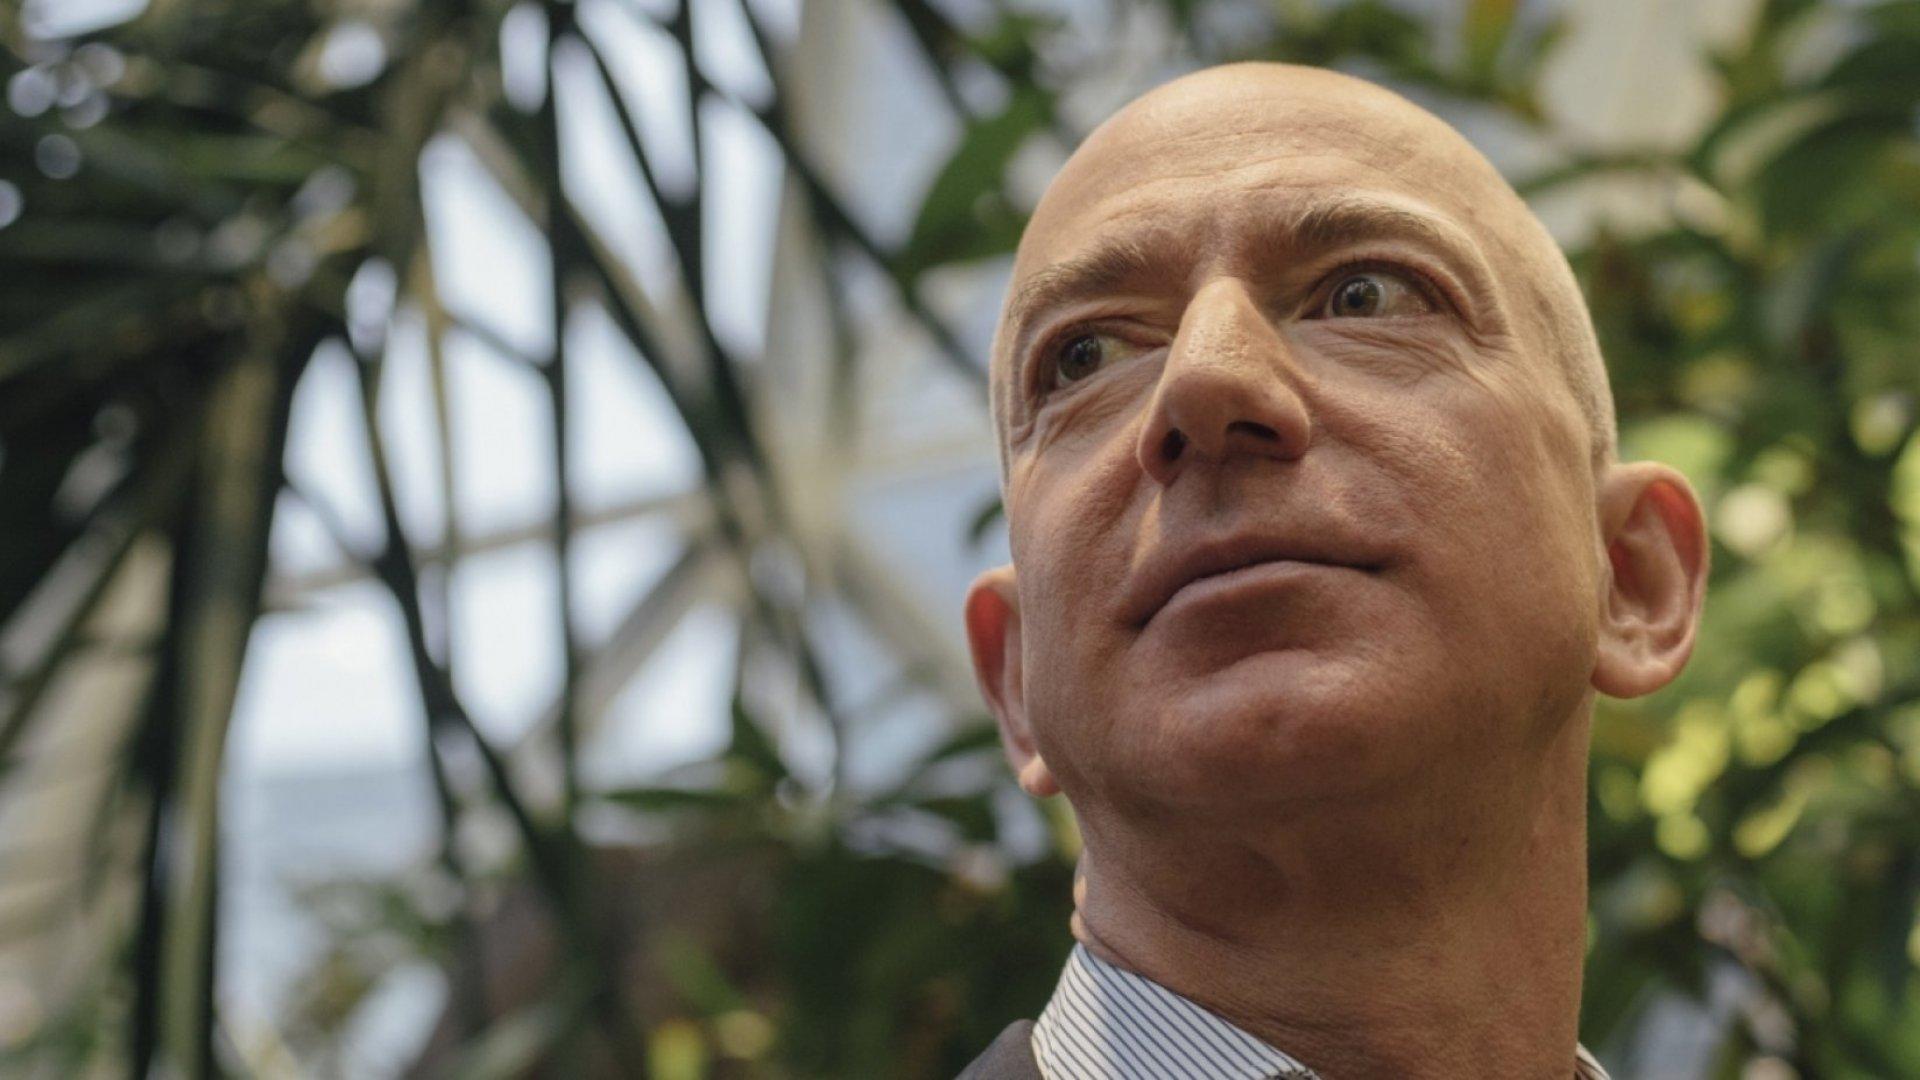 Amazon Can Control the World, According to Bezos